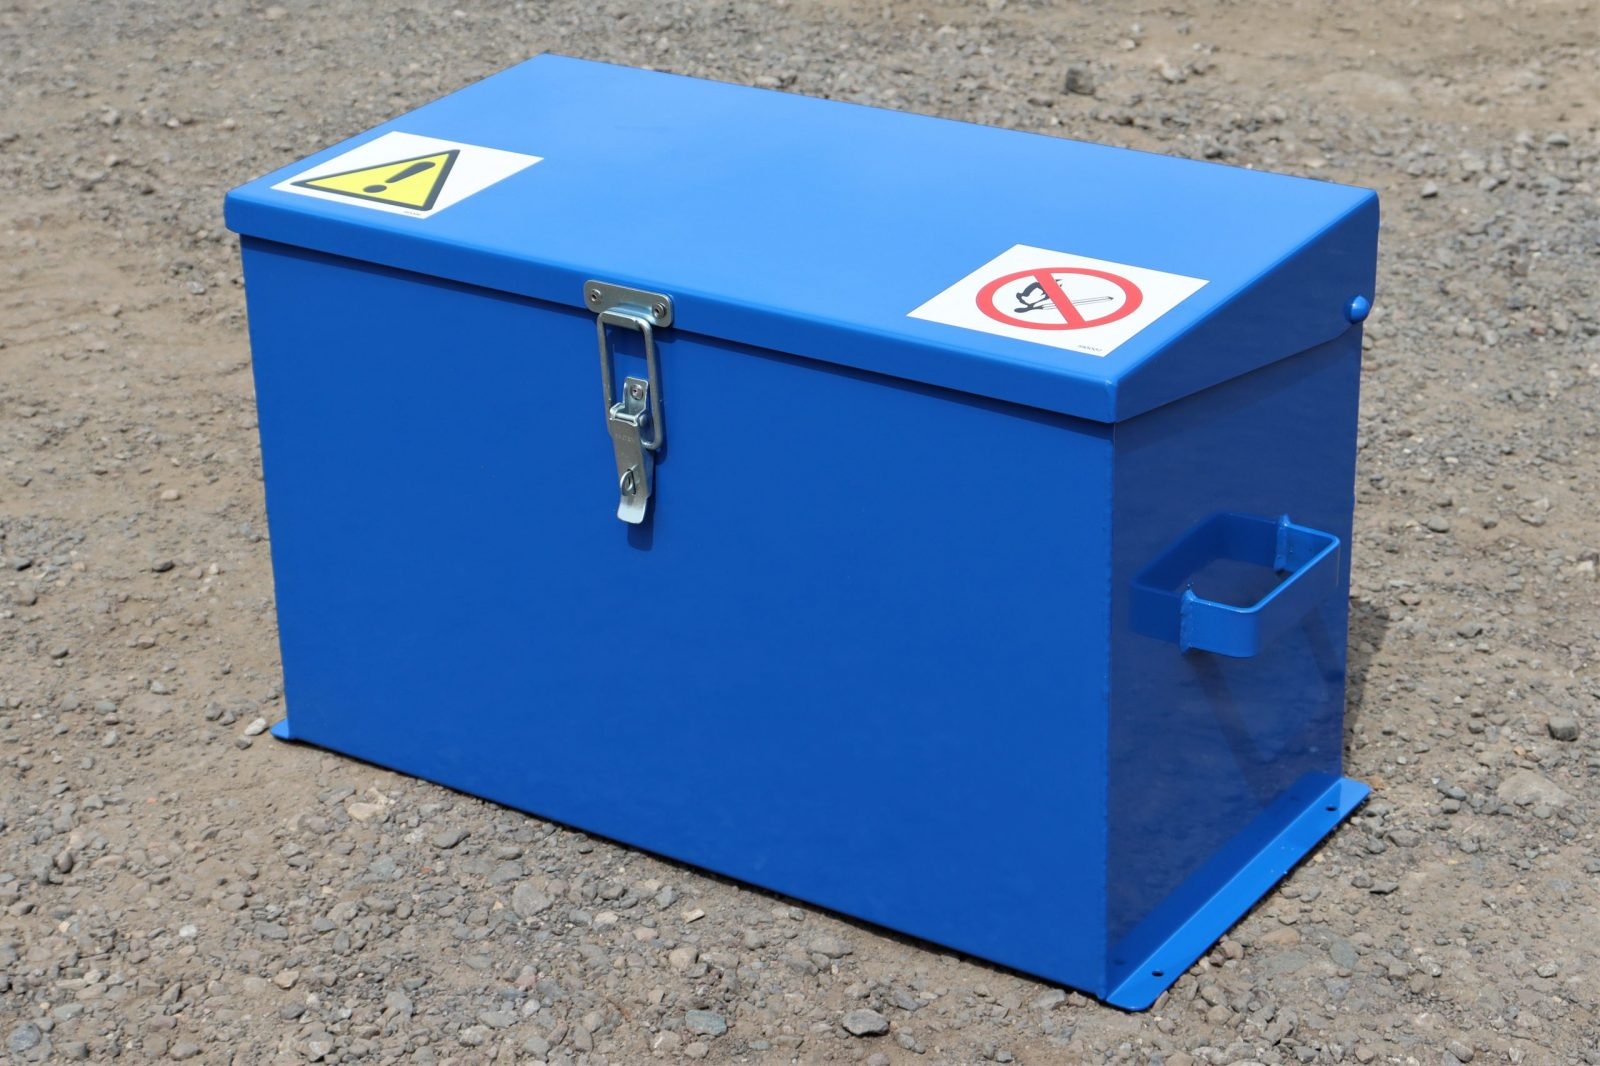 Medium Chemical Storage Safe VCS025 has 5 x 5 litre capacity